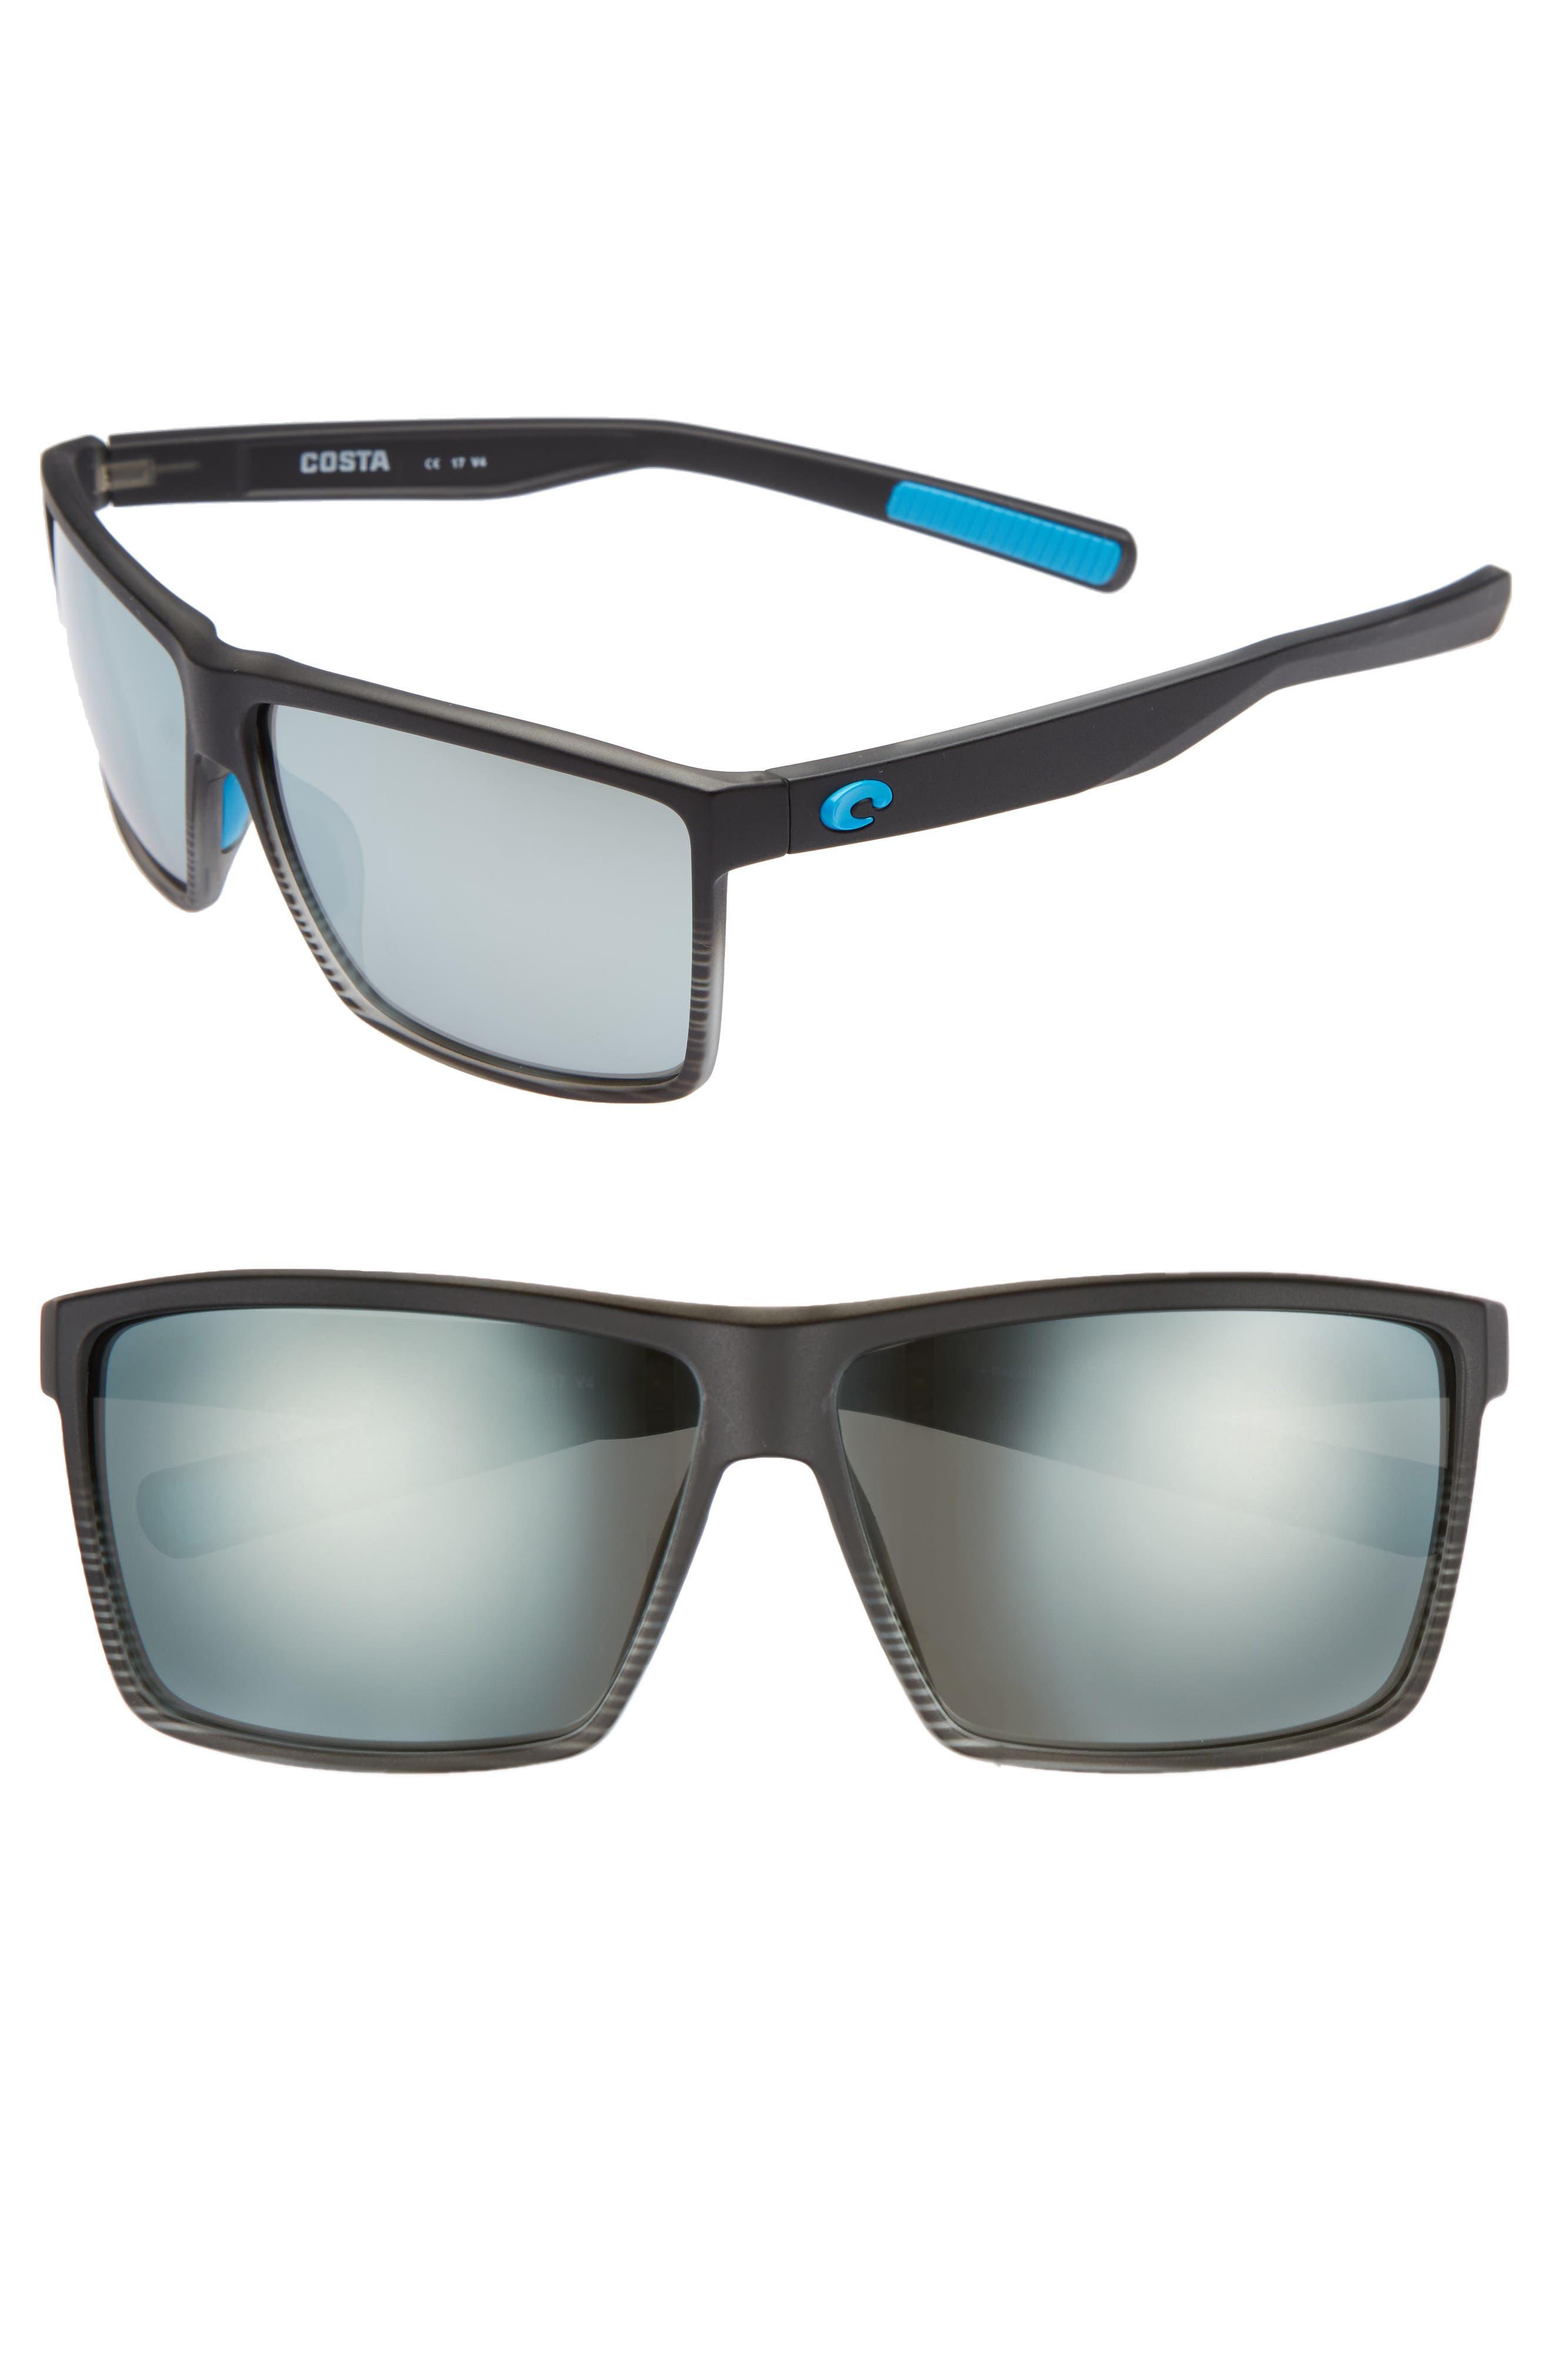 Rincon 60mm Polarized Sunglasses,                             Main thumbnail 1, color,                             021